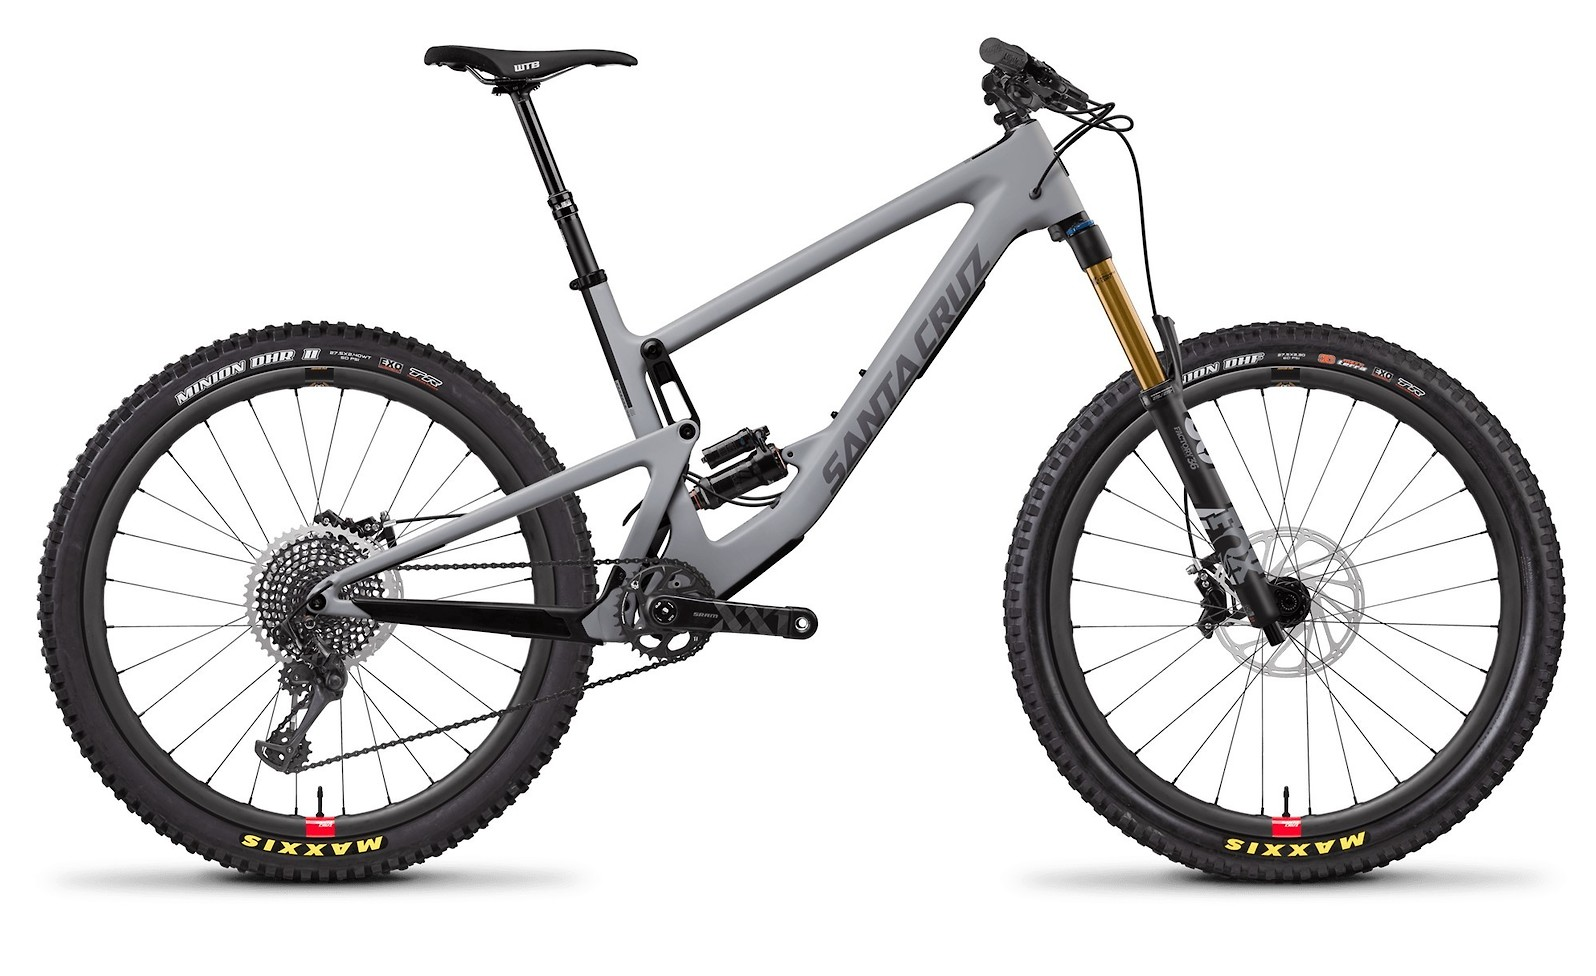 Bronson Carbon CC XX1 Primer Grey and Silver